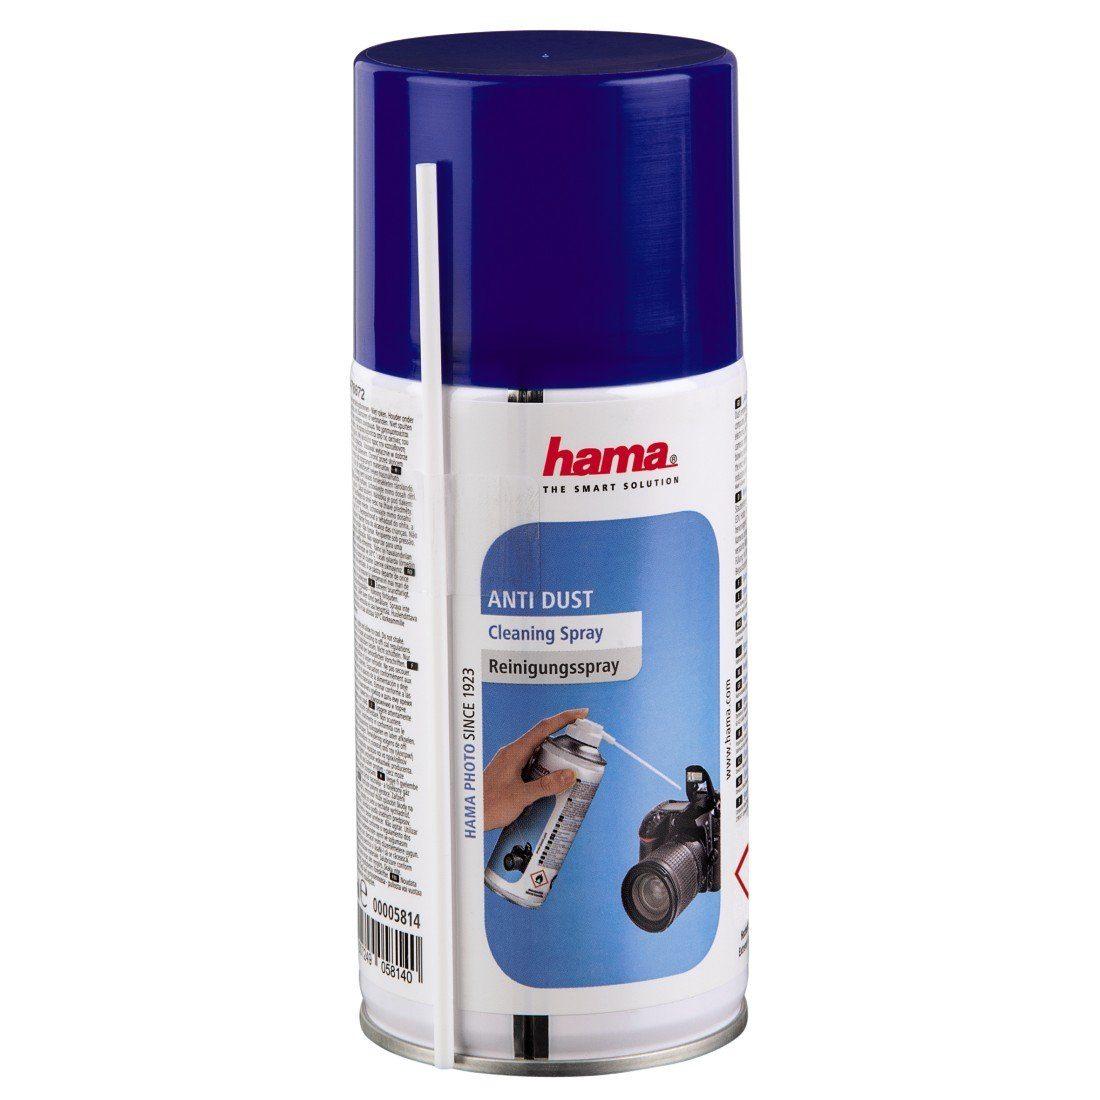 Hama Druckluftspray AntiDust, 250 ml